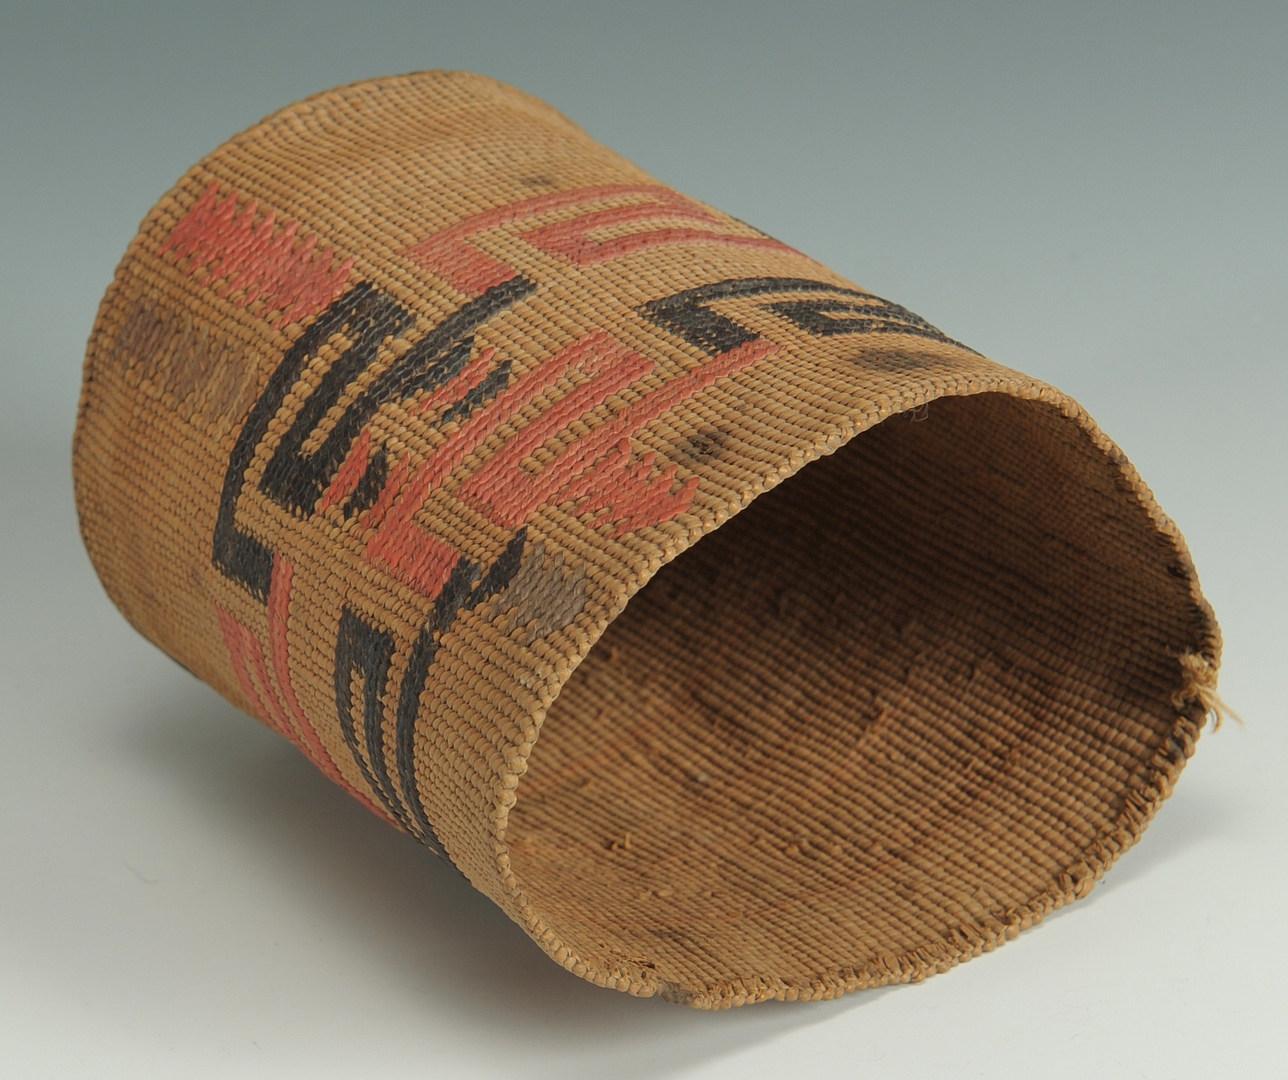 Lot 380: Native American Northwest Coast Woven Basket